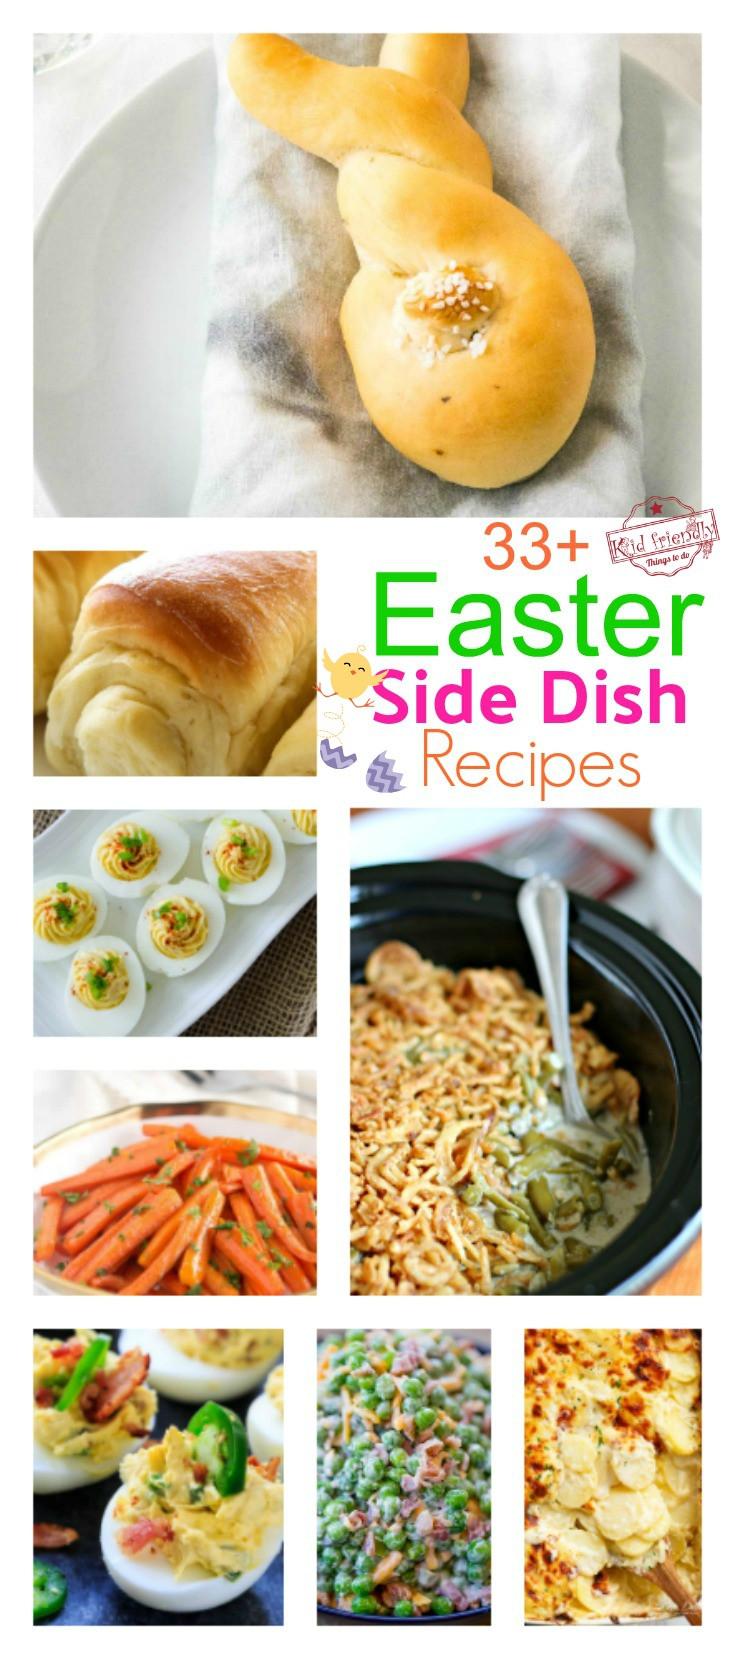 Side Dish For Easter Dinner  Over 33 Easter Side Dish Recipes for Your Celebration Dinner